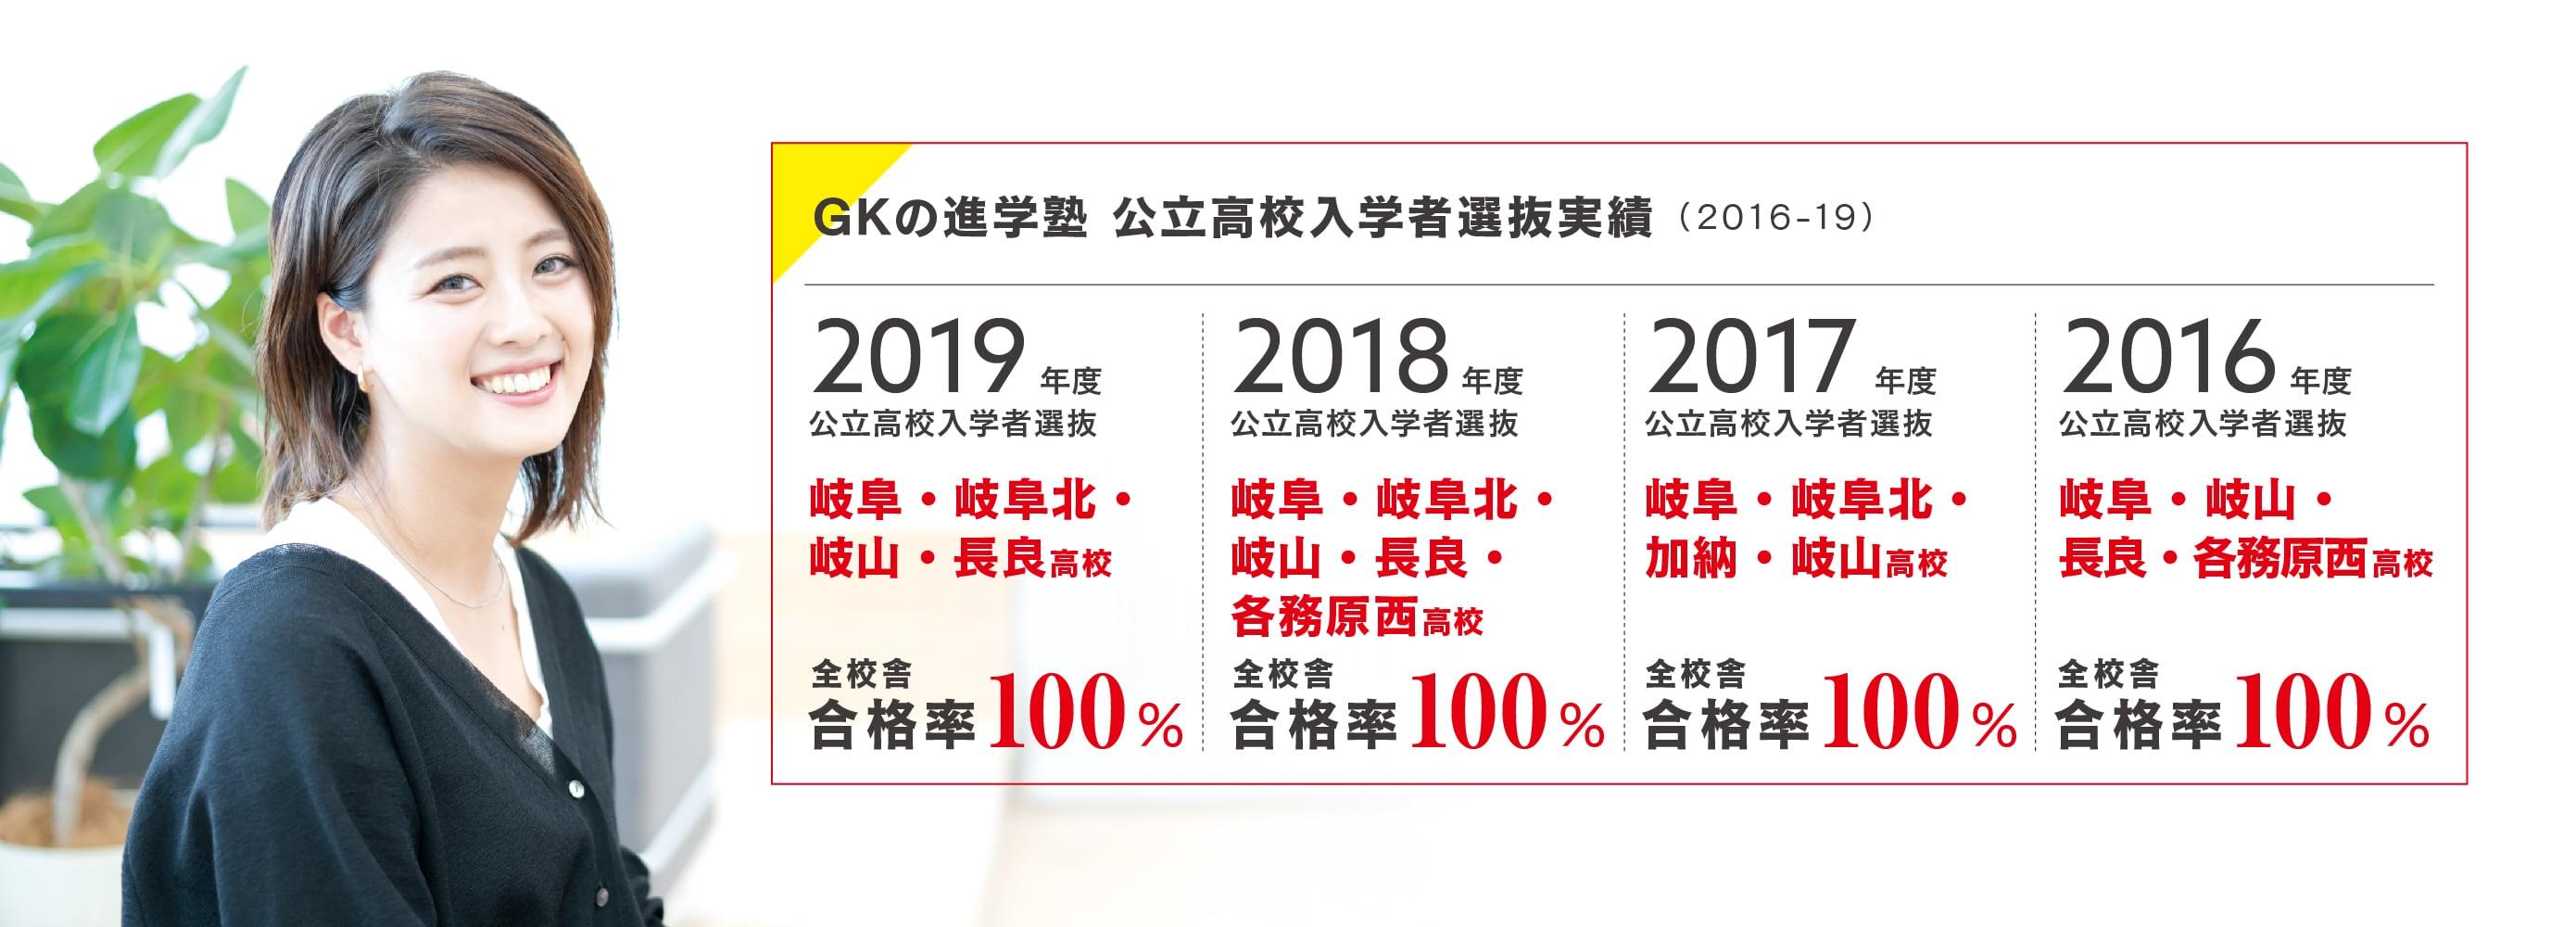 GKの進学塾 公立高校入学者選抜実績